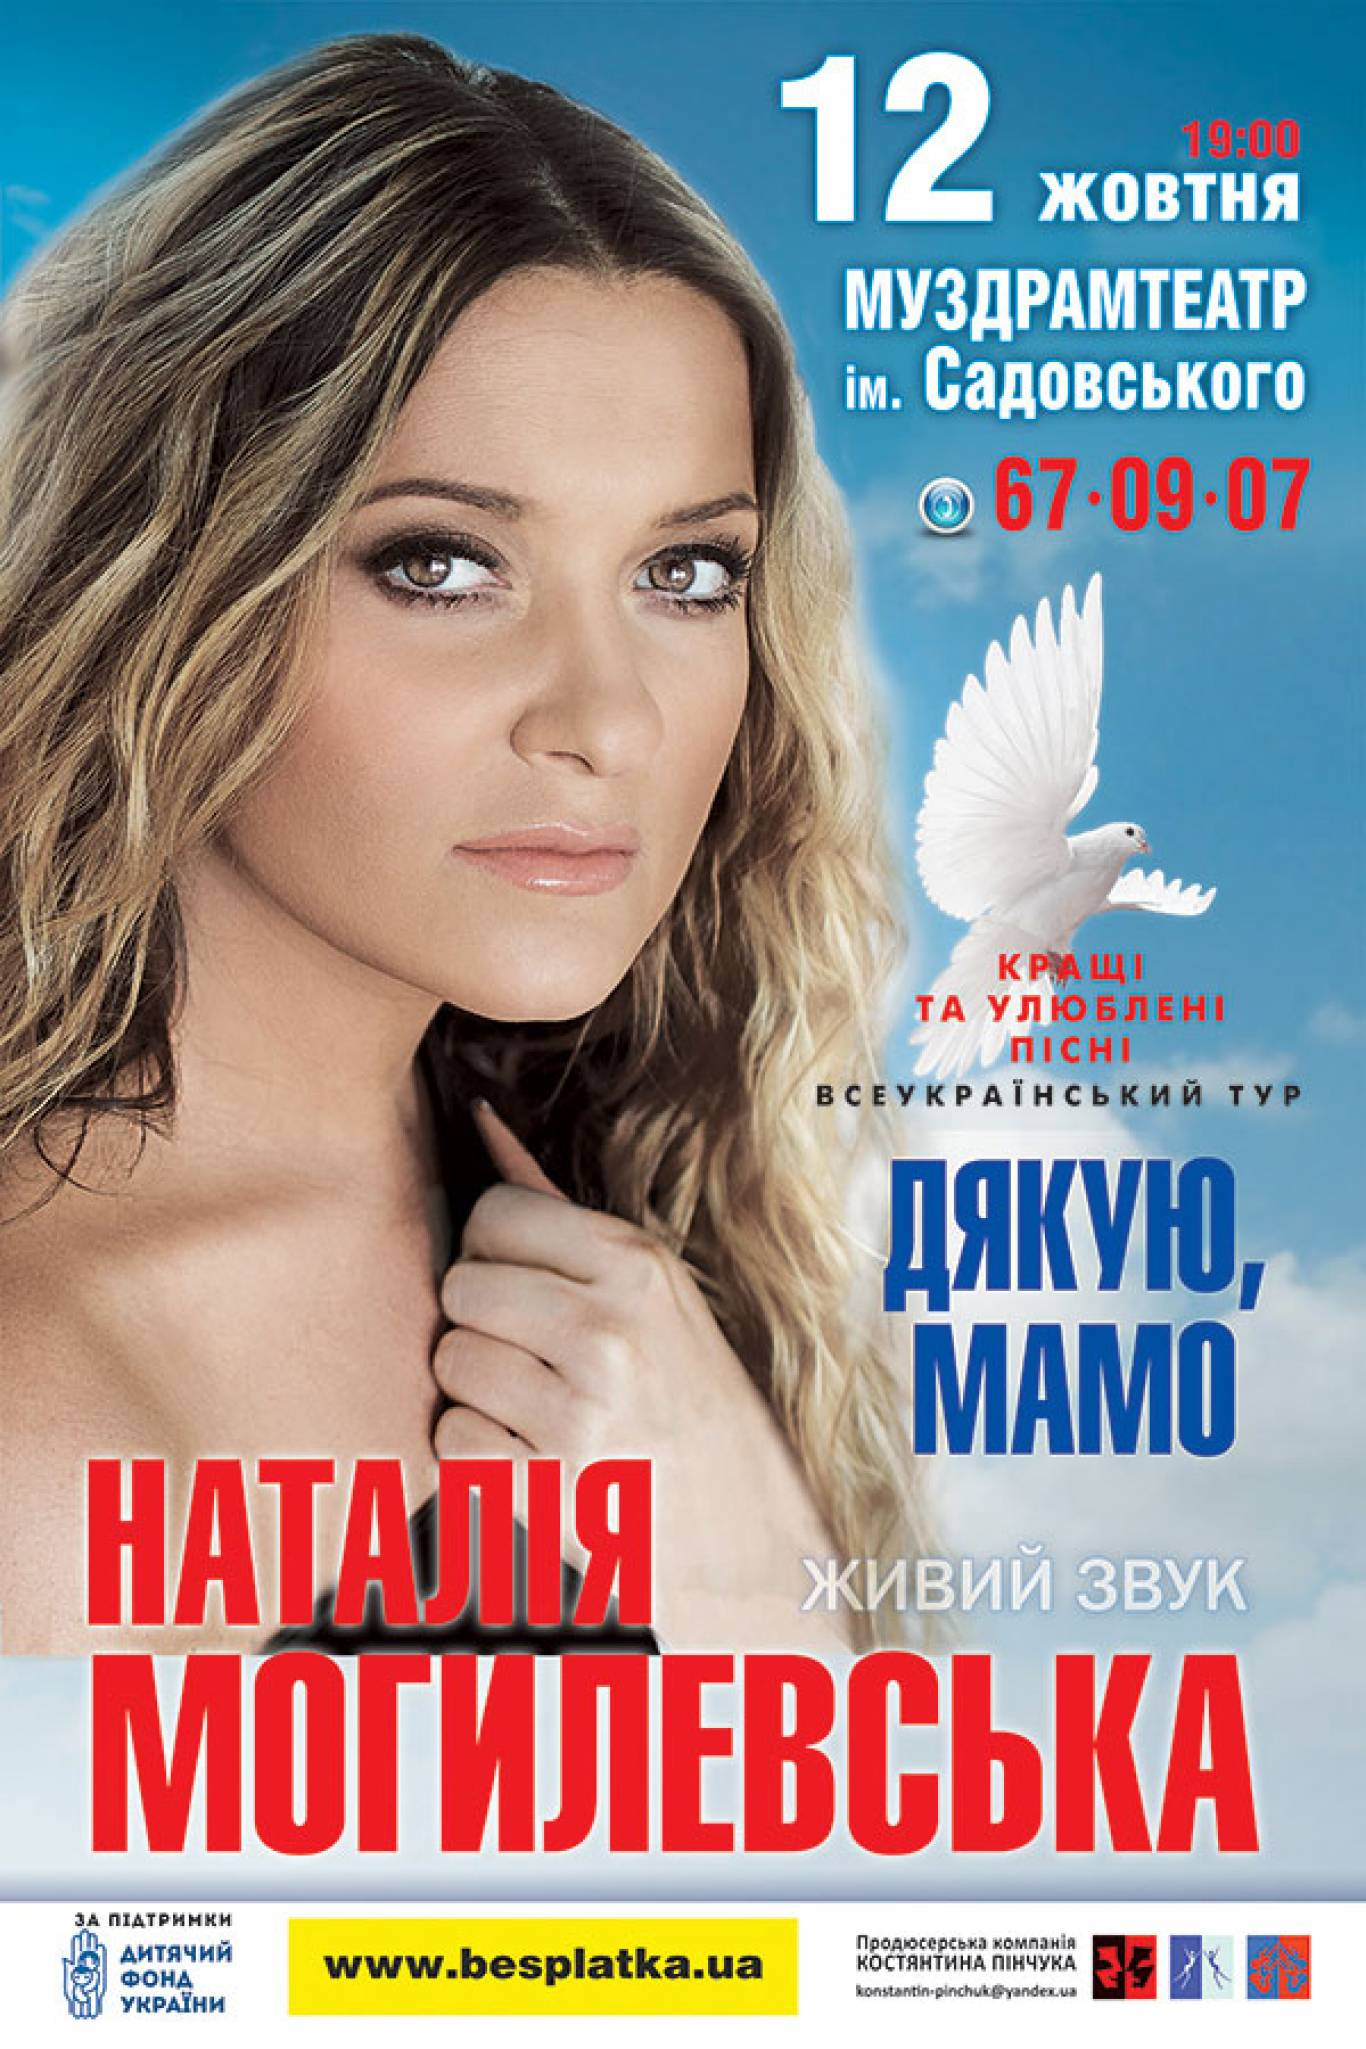 "Всеукраїнський тур Наталі Могилевської ""Дякую, мамо!"""